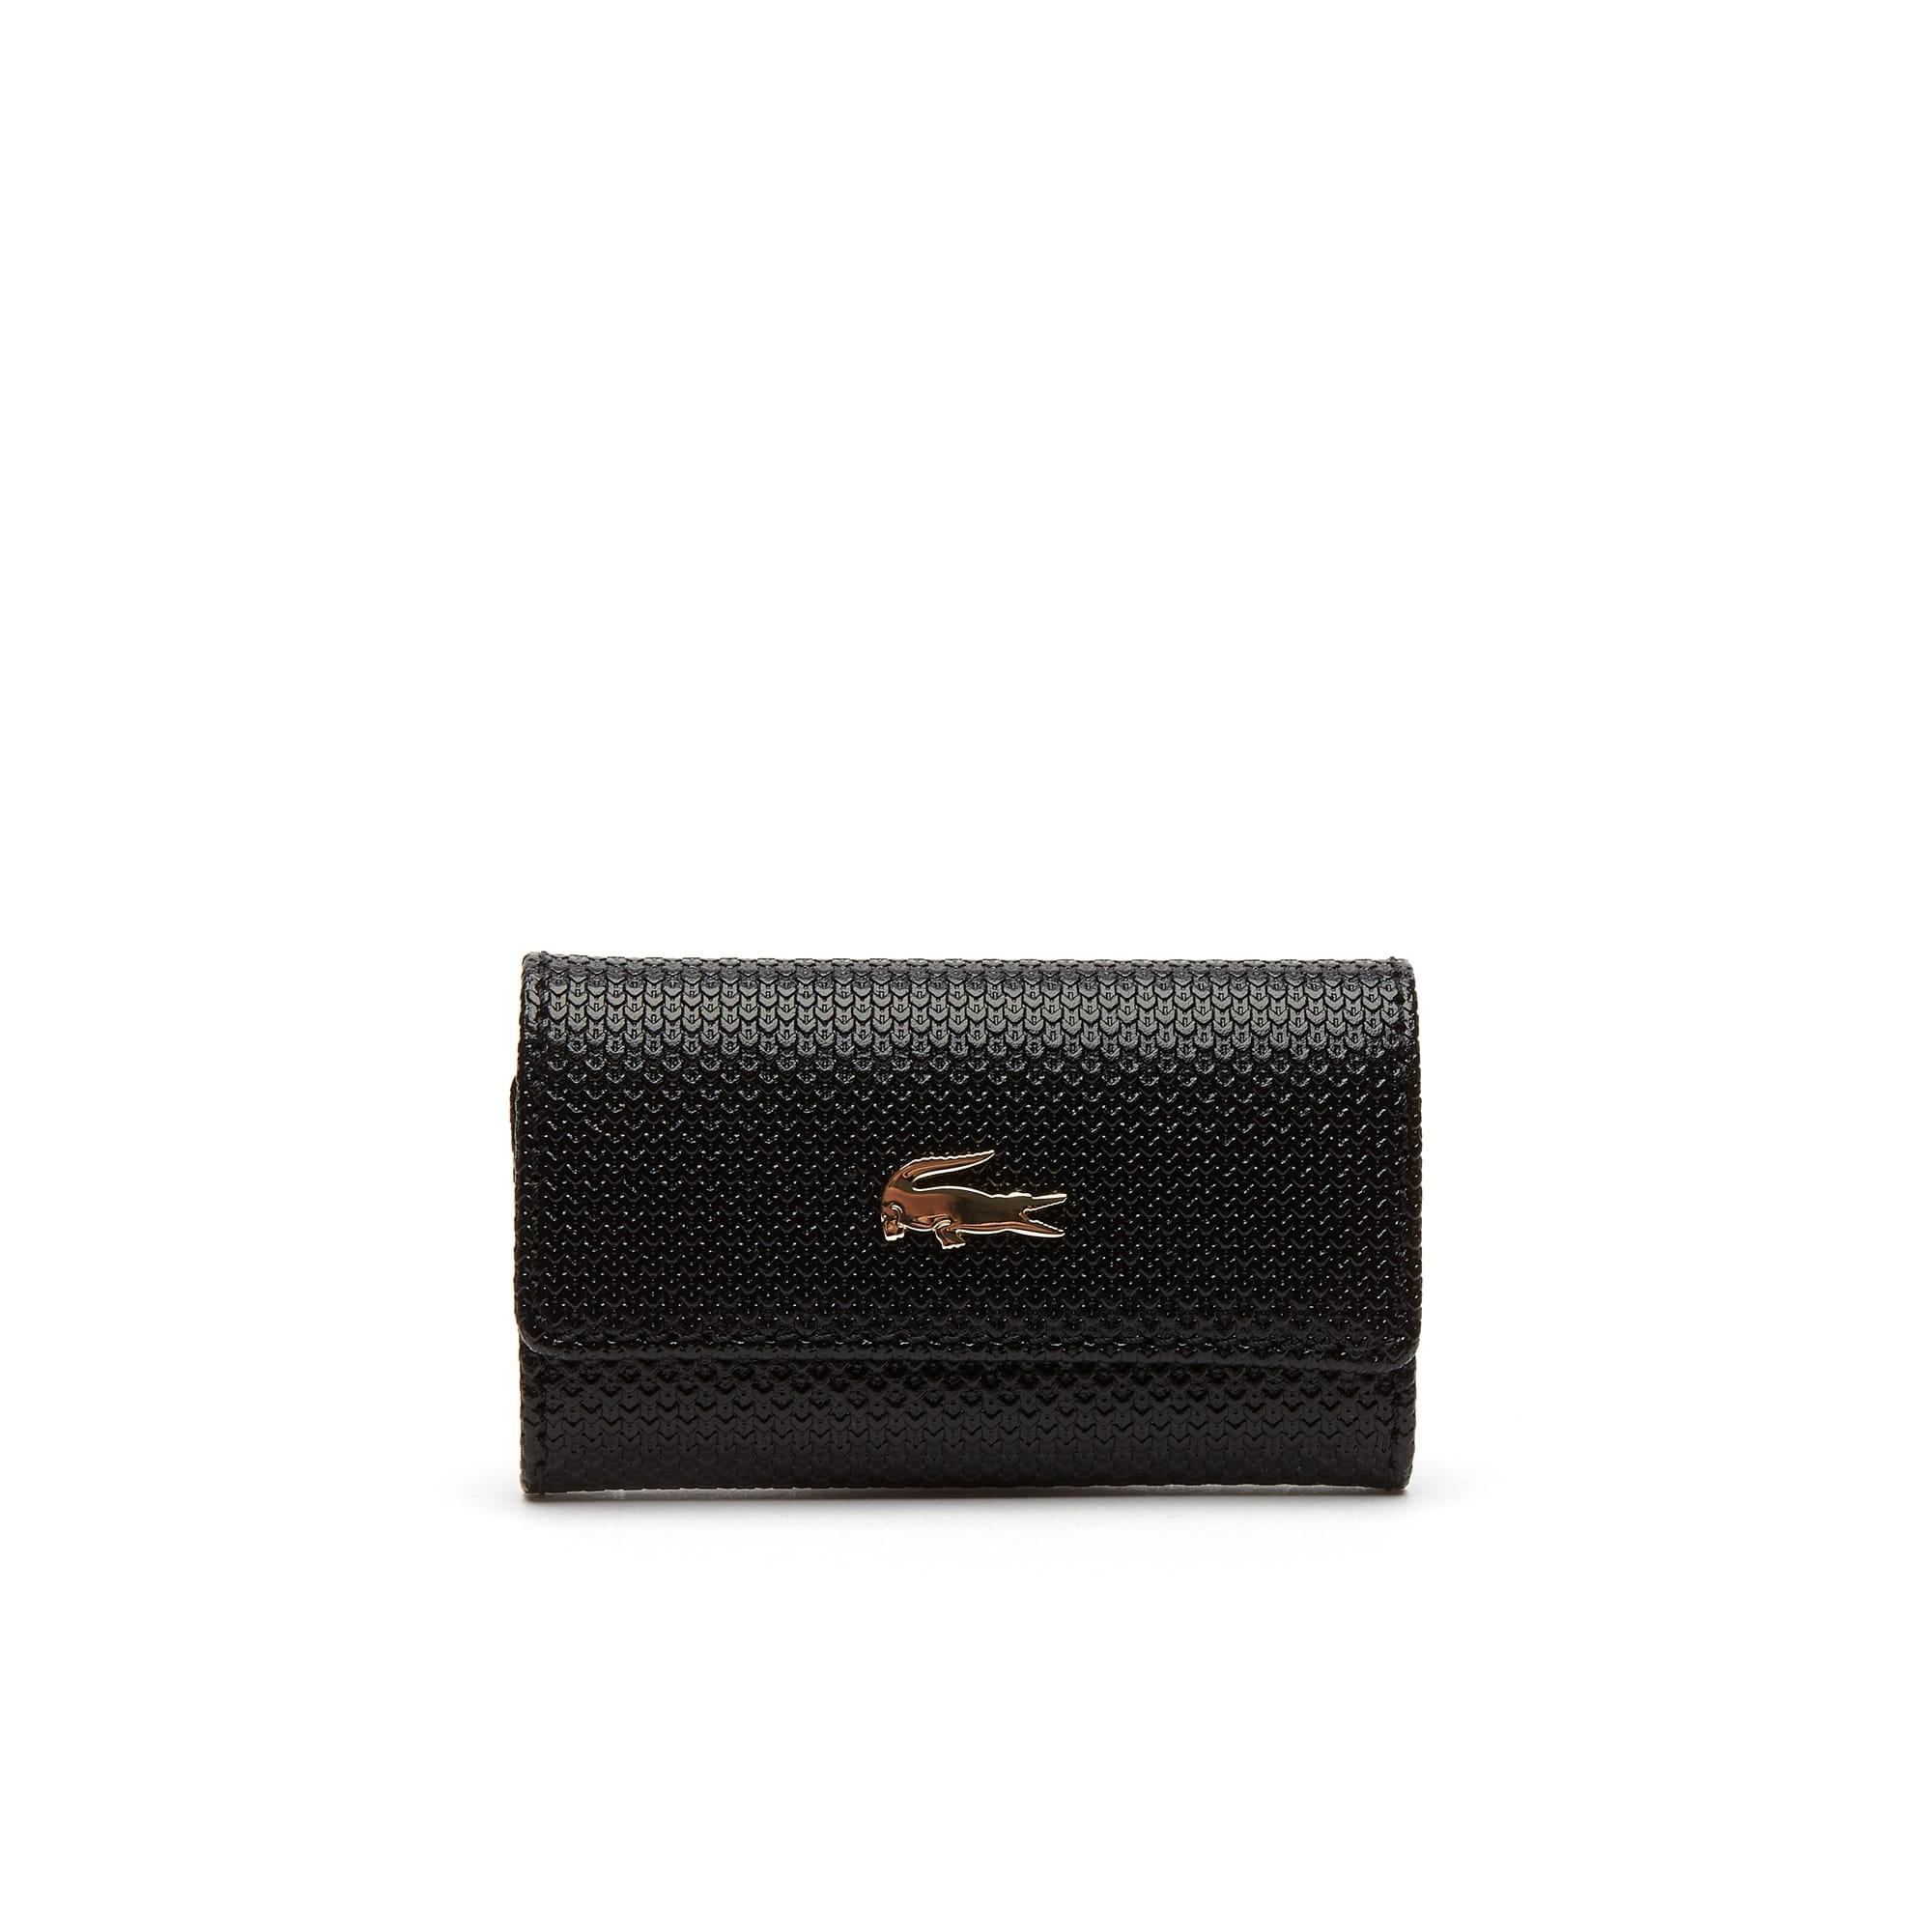 Women's Chantaco Piqué Leather Key Holder